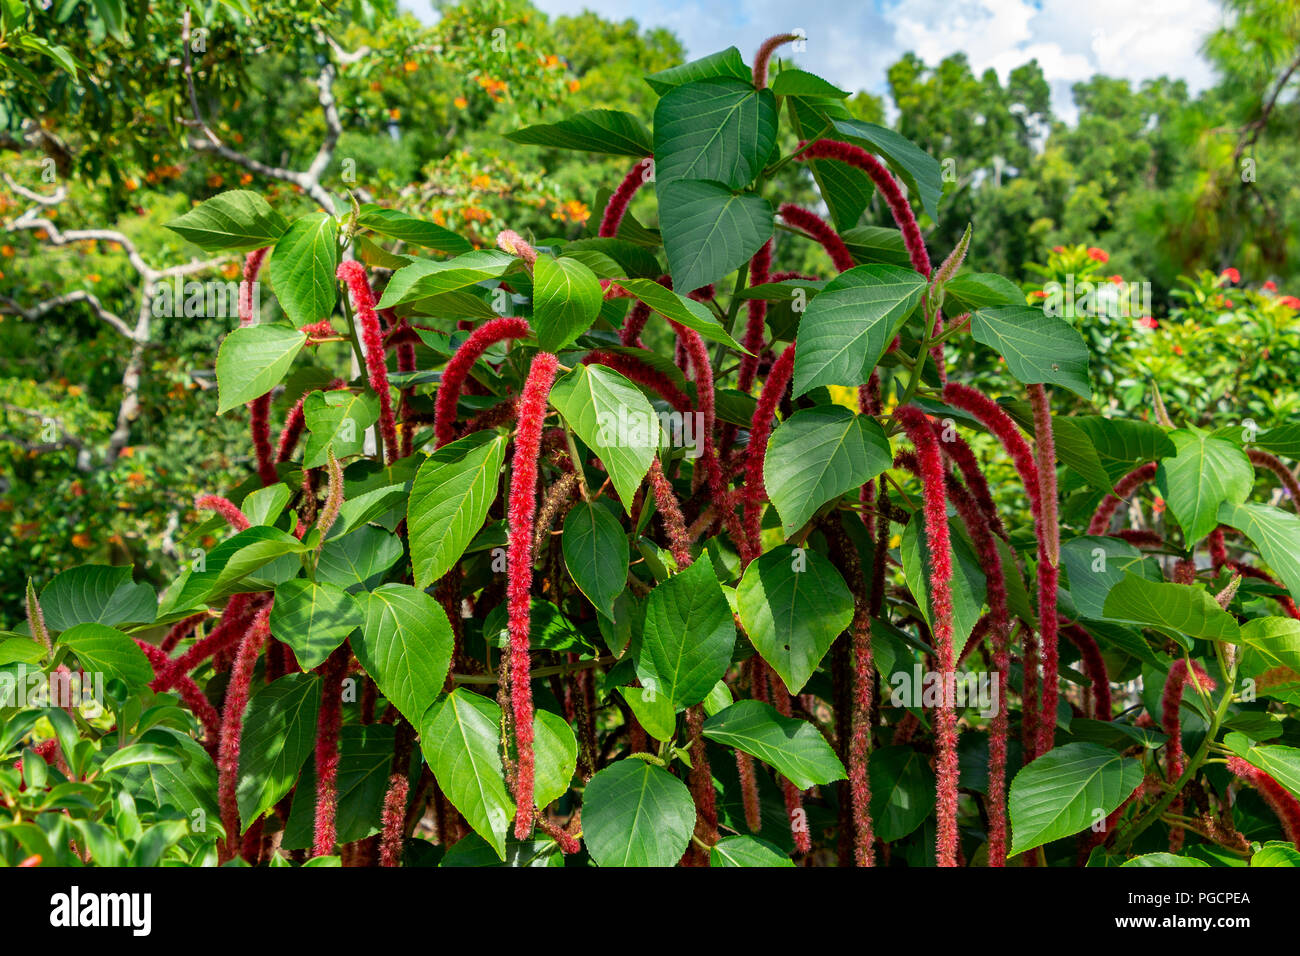 Chenille Plant Acalypha Hispida Delray Beach Florida Usa Stock